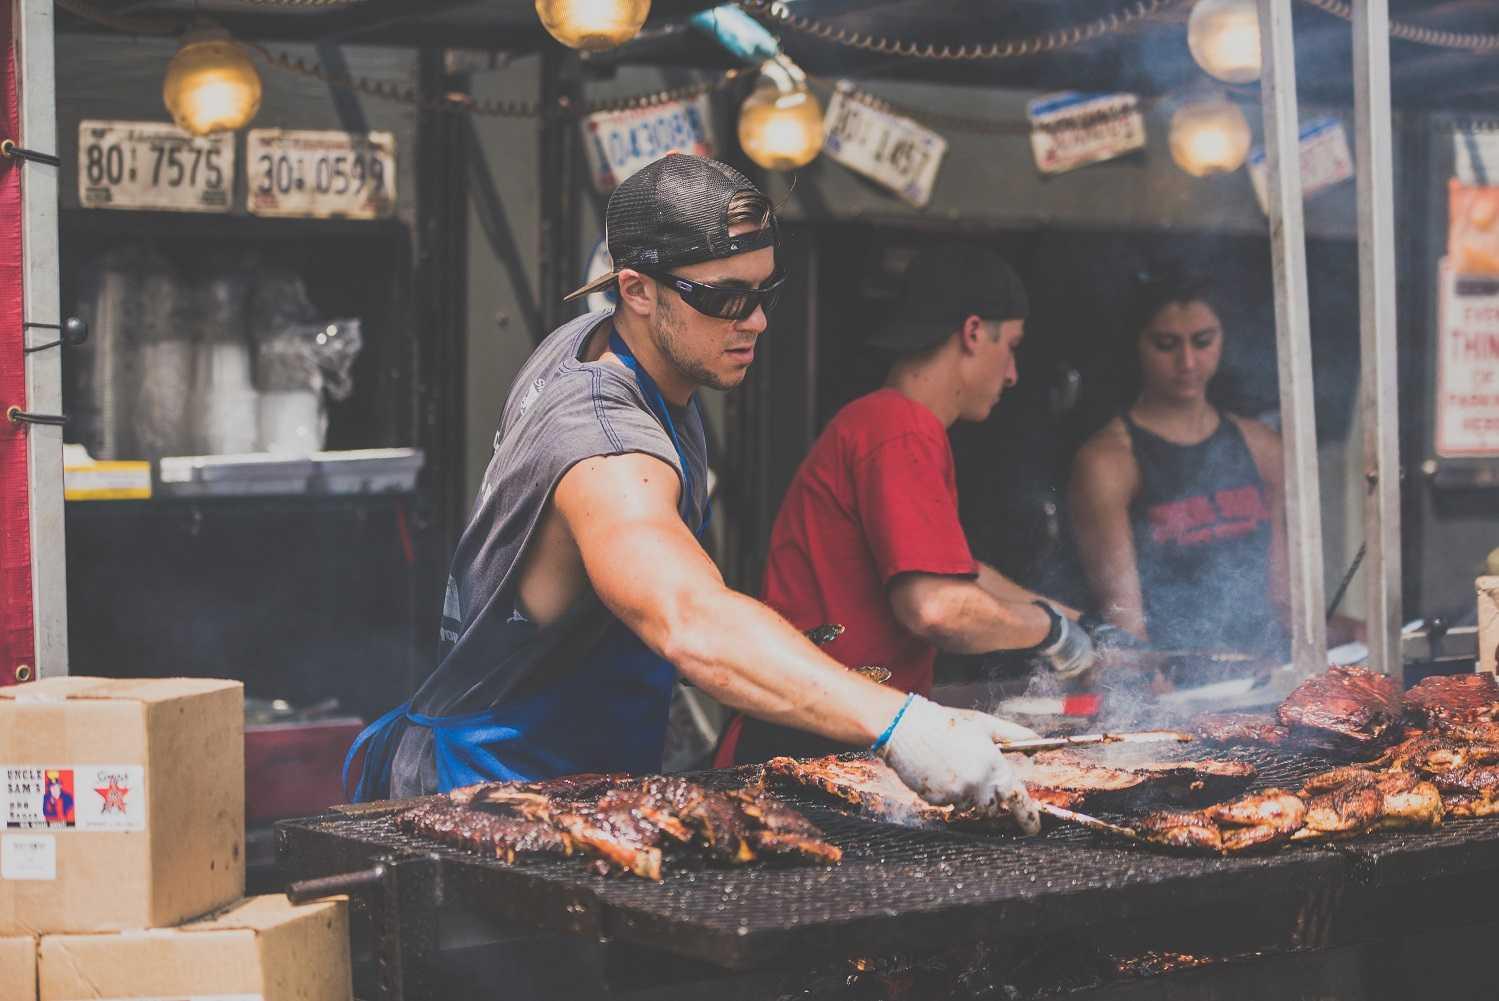 Outdoor barbecue spot in Dallas, Texas